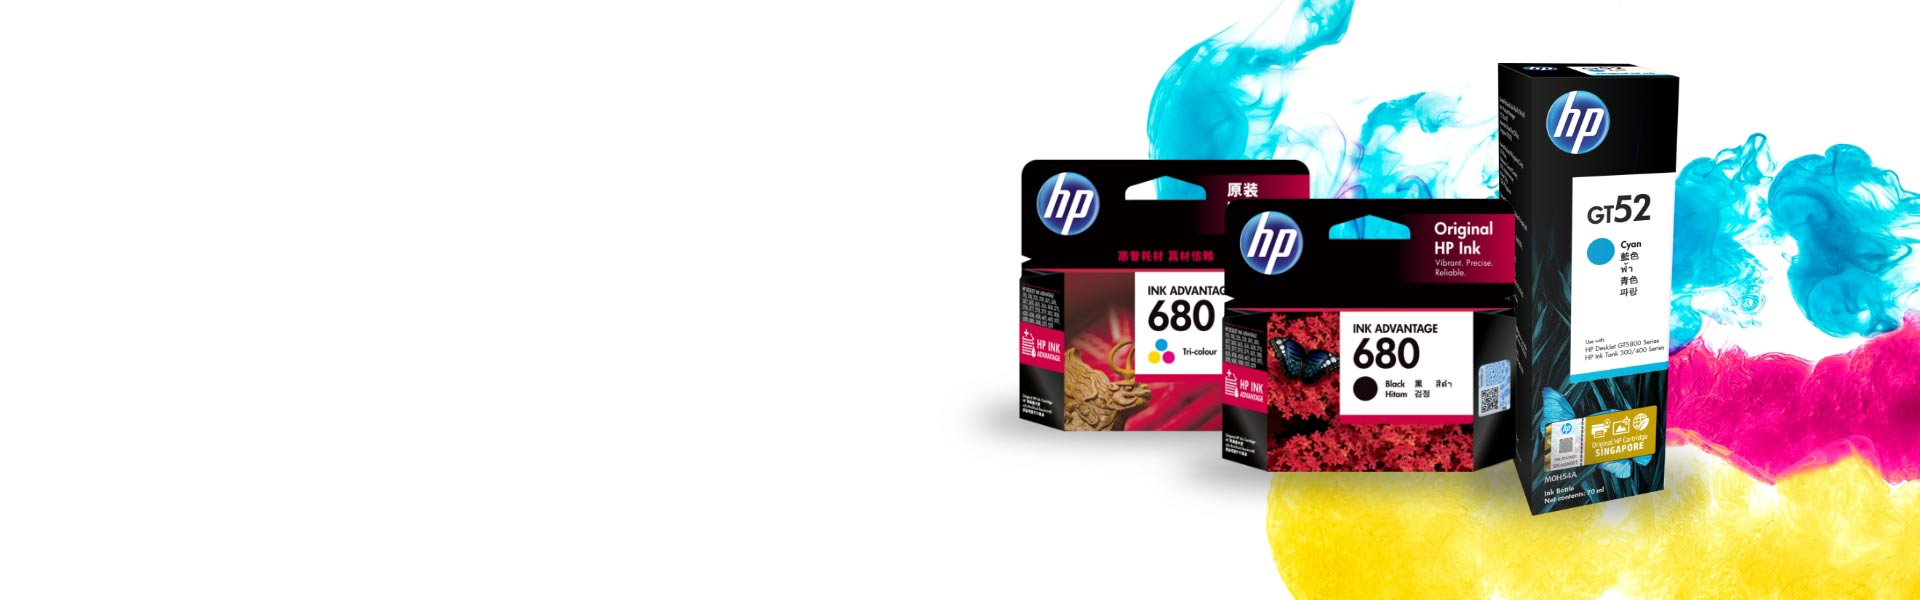 HP Supplies Day